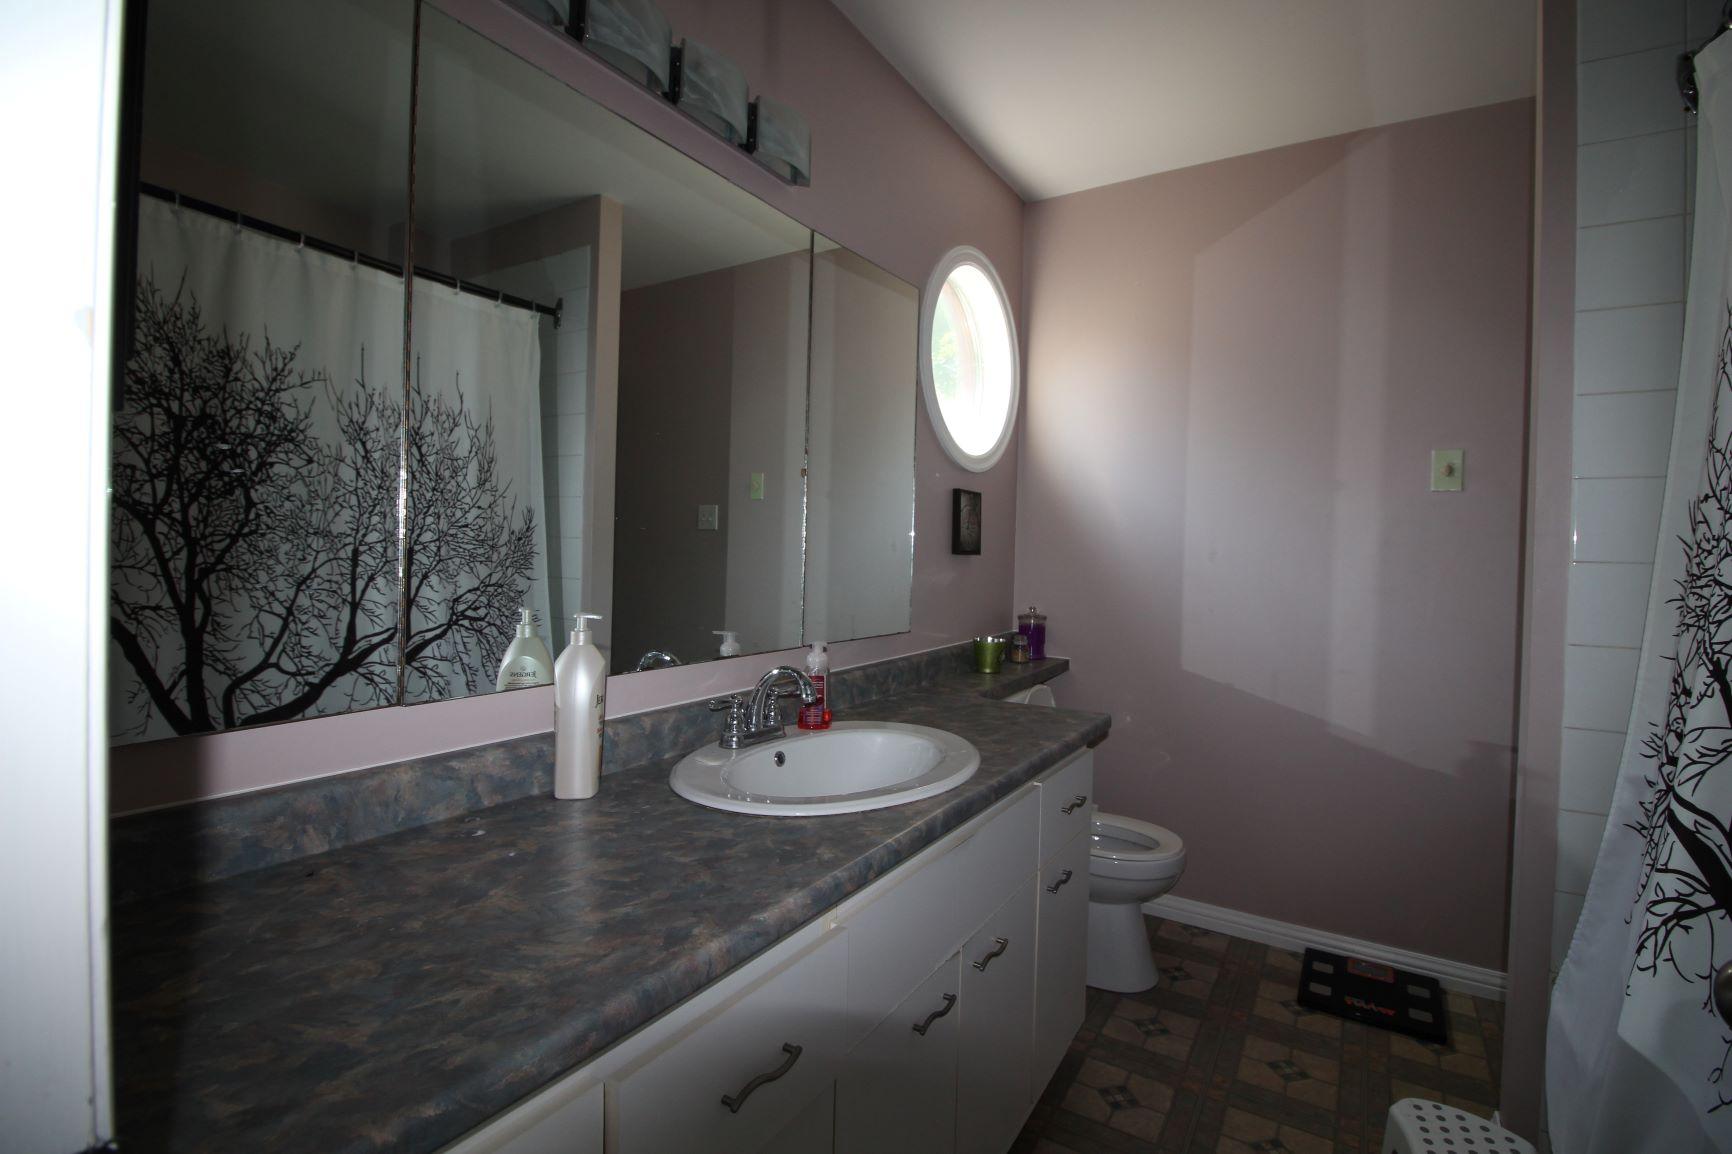 110 Wilmot Place Winnipeg,Manitoba,2 Bedrooms Bedrooms,2 BathroomsBathrooms,Condo,Wilmot Place,1201